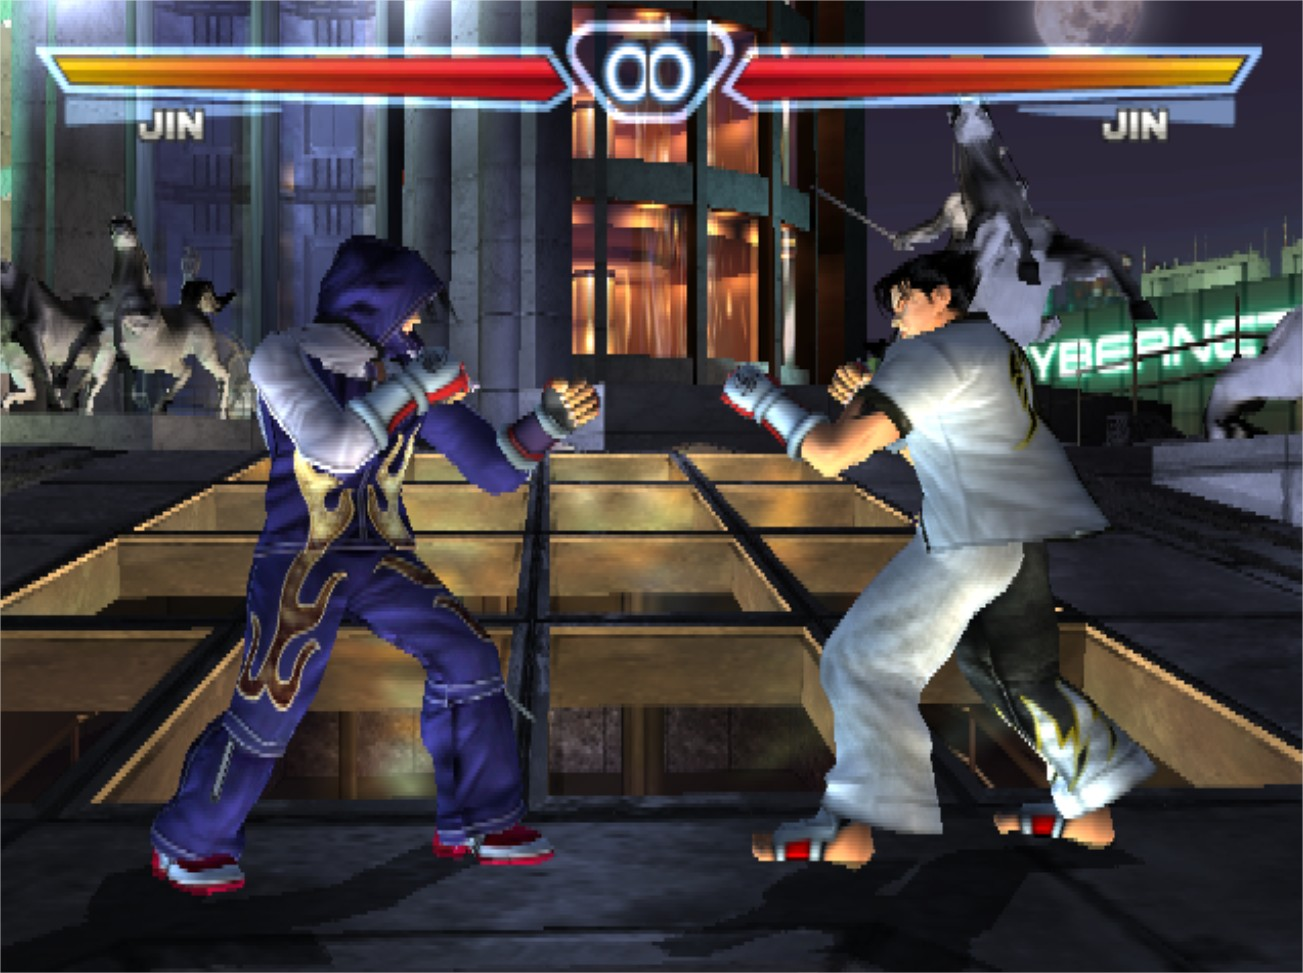 Jin_Kazama_-_Tekken_4_Outfits_Pic_2.jpg